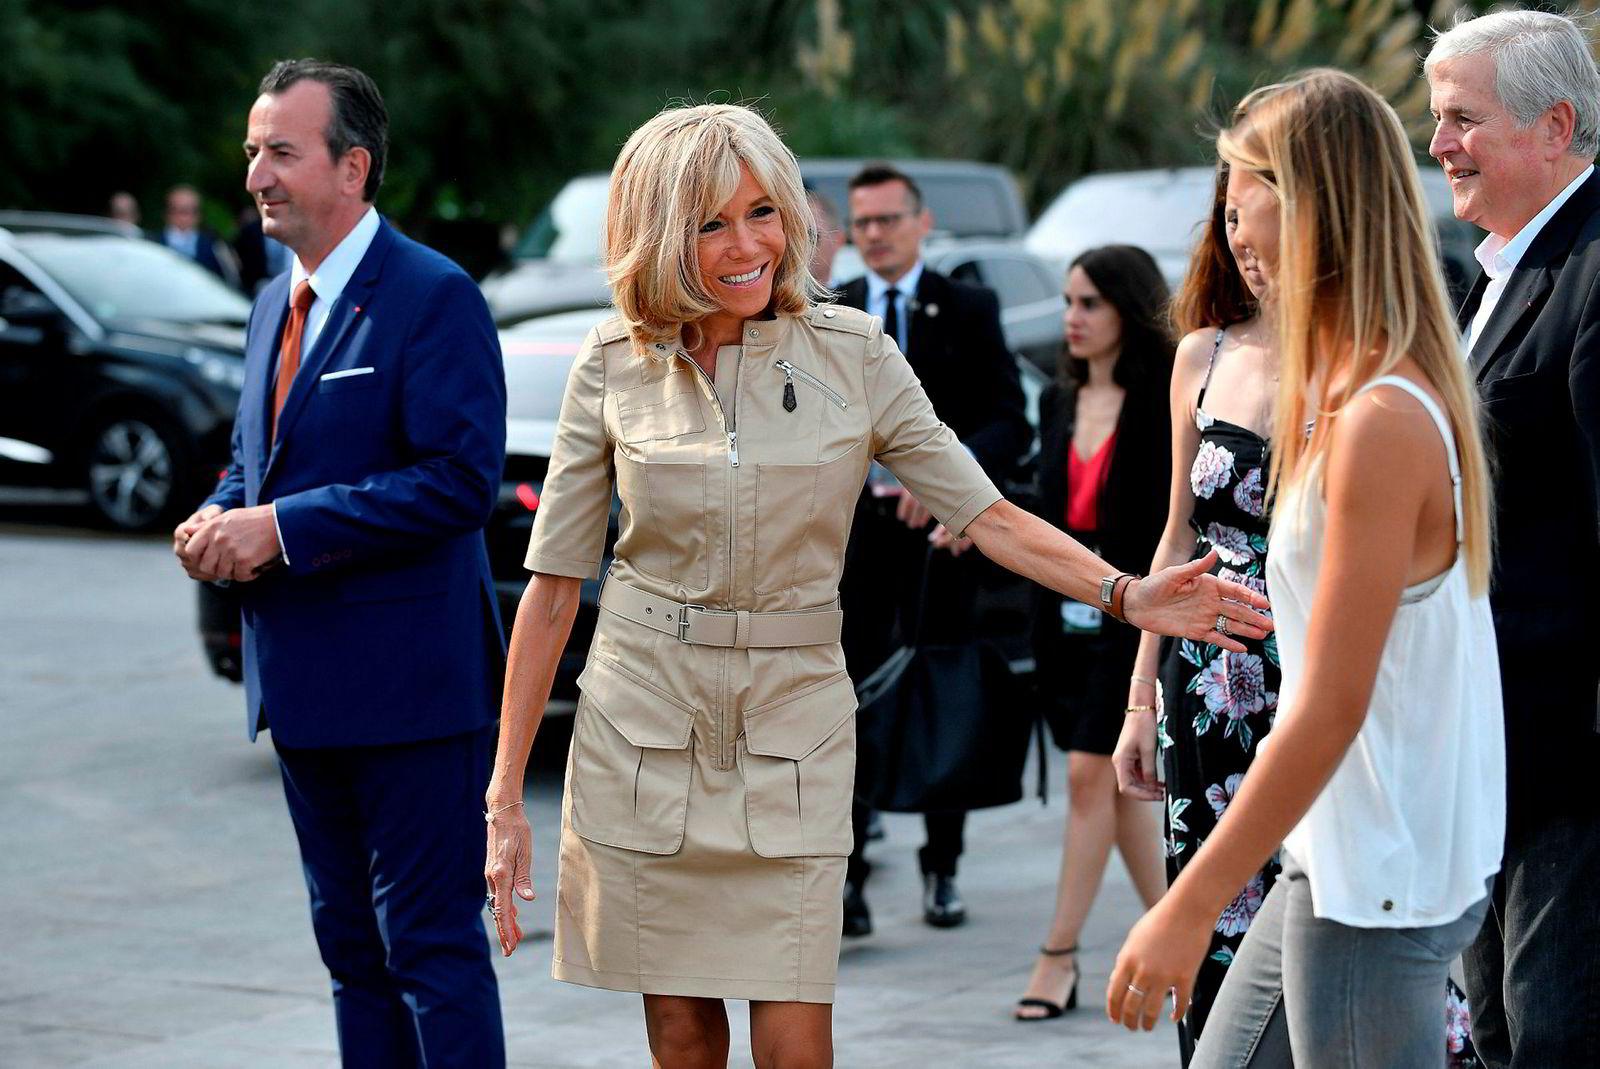 Frankrikes førstedame Brigitte Macron (i midten). Frankrikes president Emmanuel Macron liker dårlig at Brasils president Jair Bolsonaro har kommet med ufine kommentarer om fru Macron.